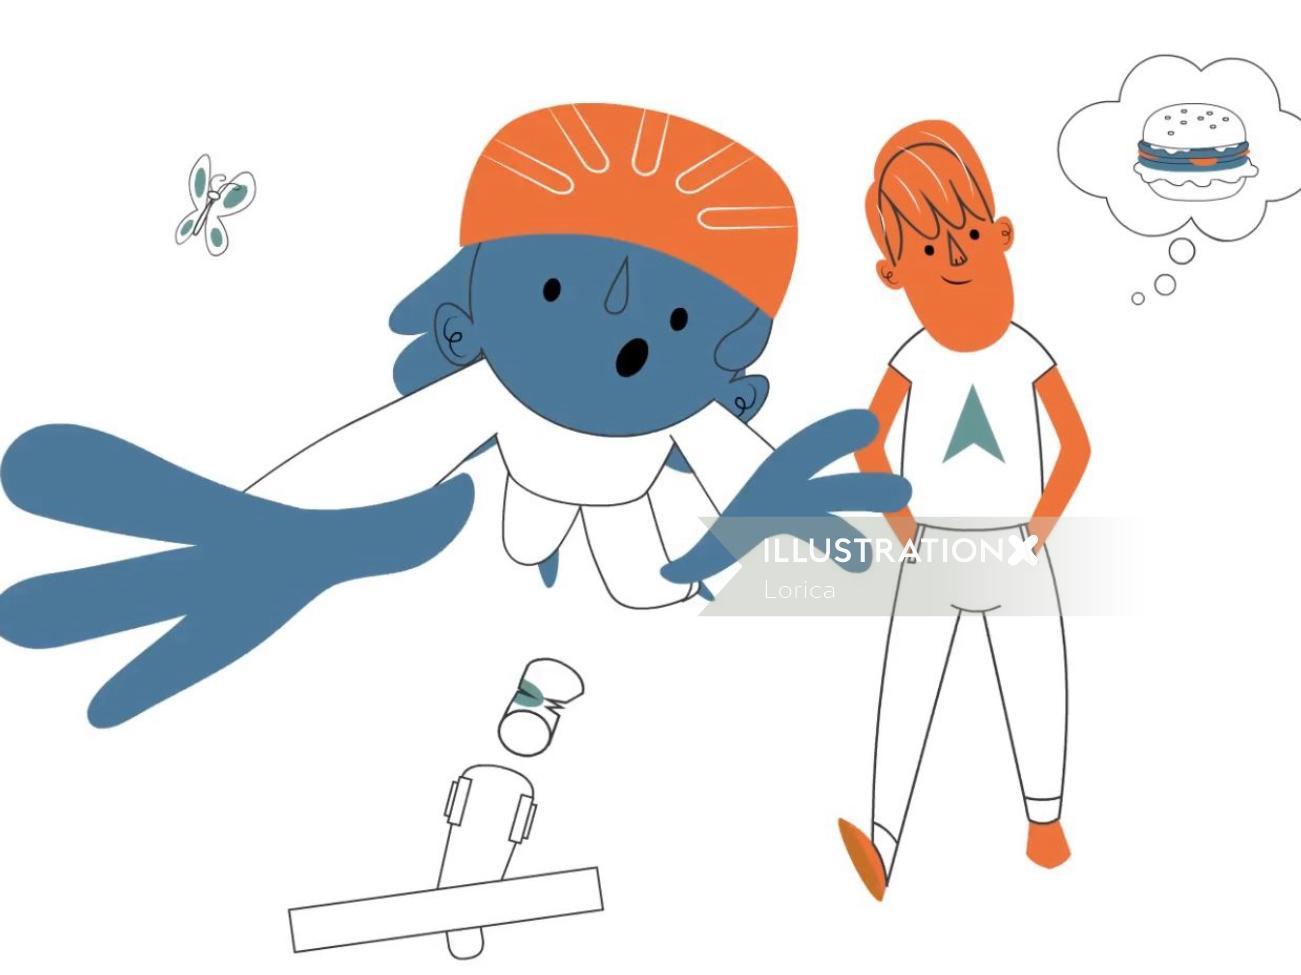 View Lorica's animation portfolio